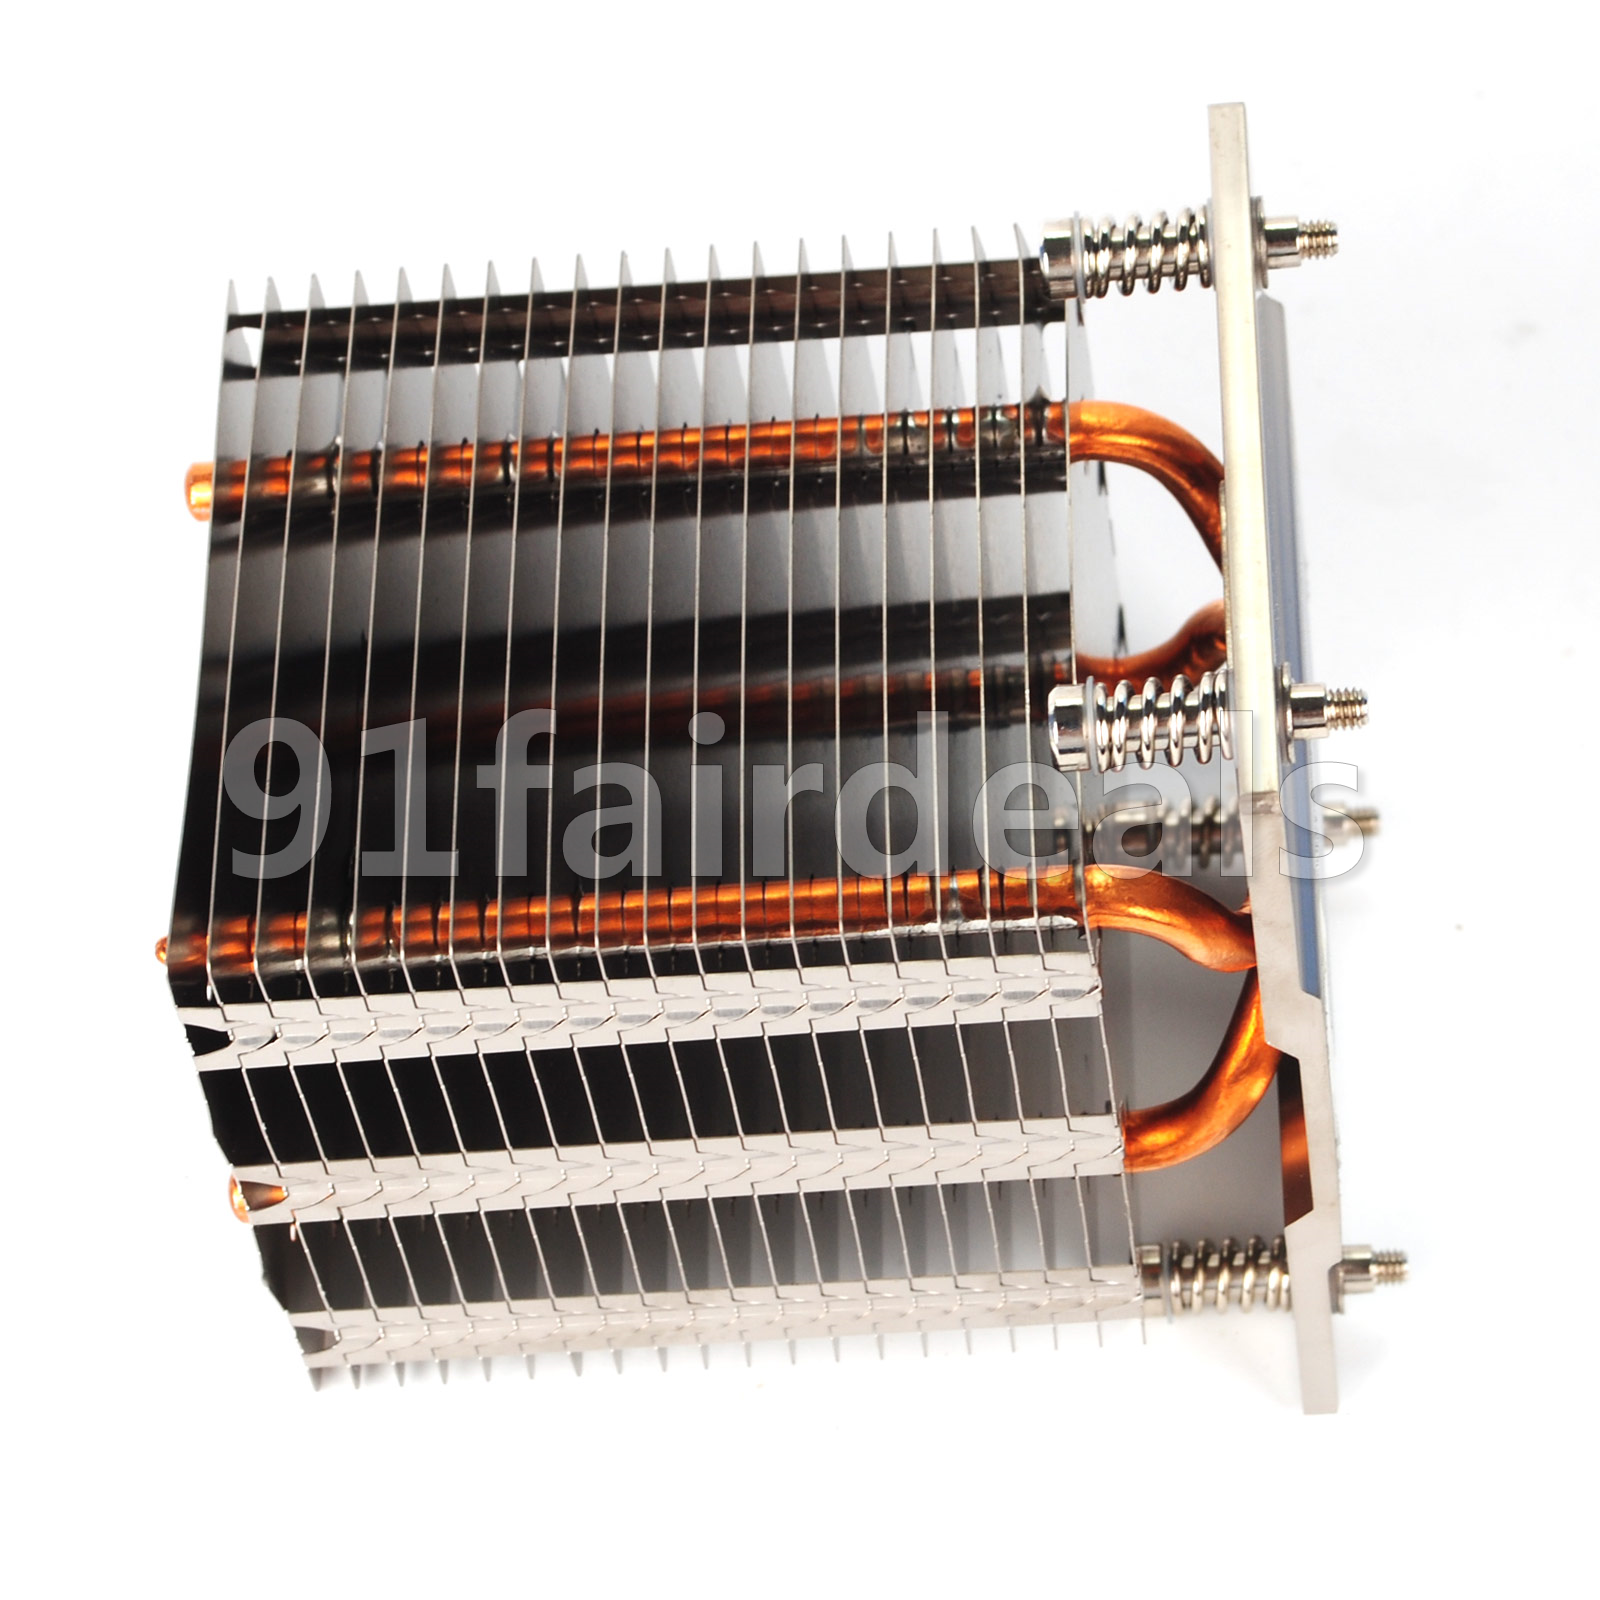 New Dell PowerEdge T430 Tower Server Workstation Heatsink 0WC4DX WC4DX